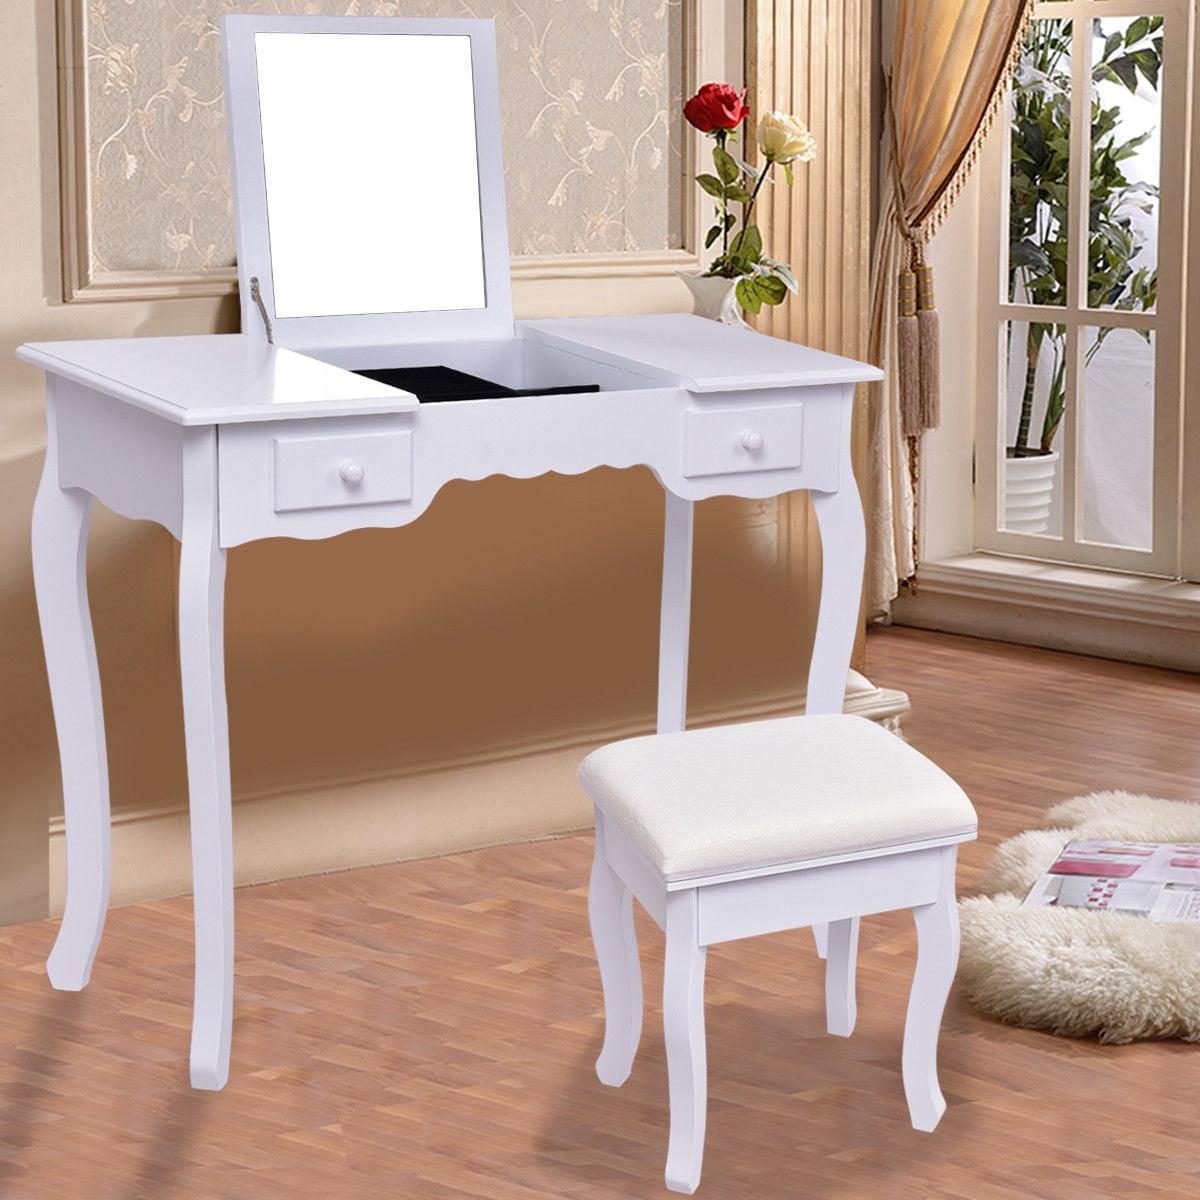 Costway Vanity Dressing Table Set Mirrored bathroom W Stool Table Desk White by Costway